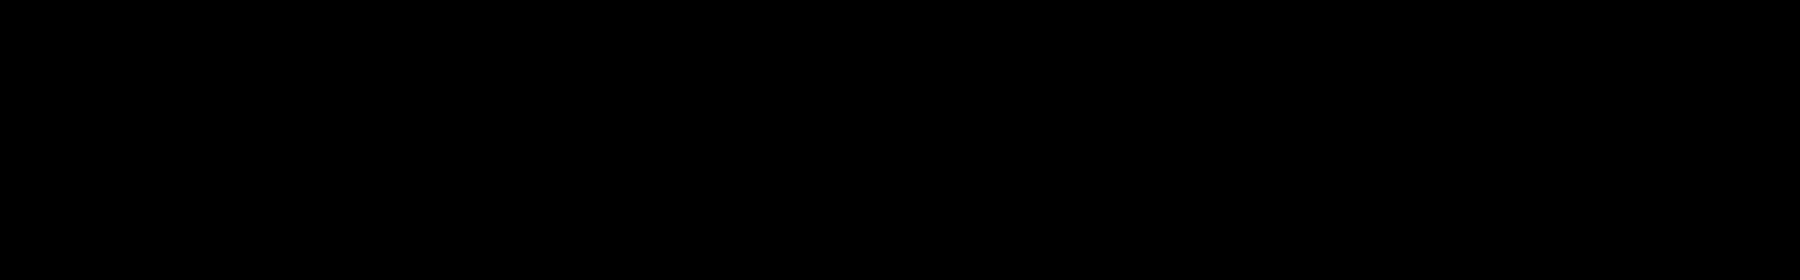 Baker's Cthulhu 1 audio waveform